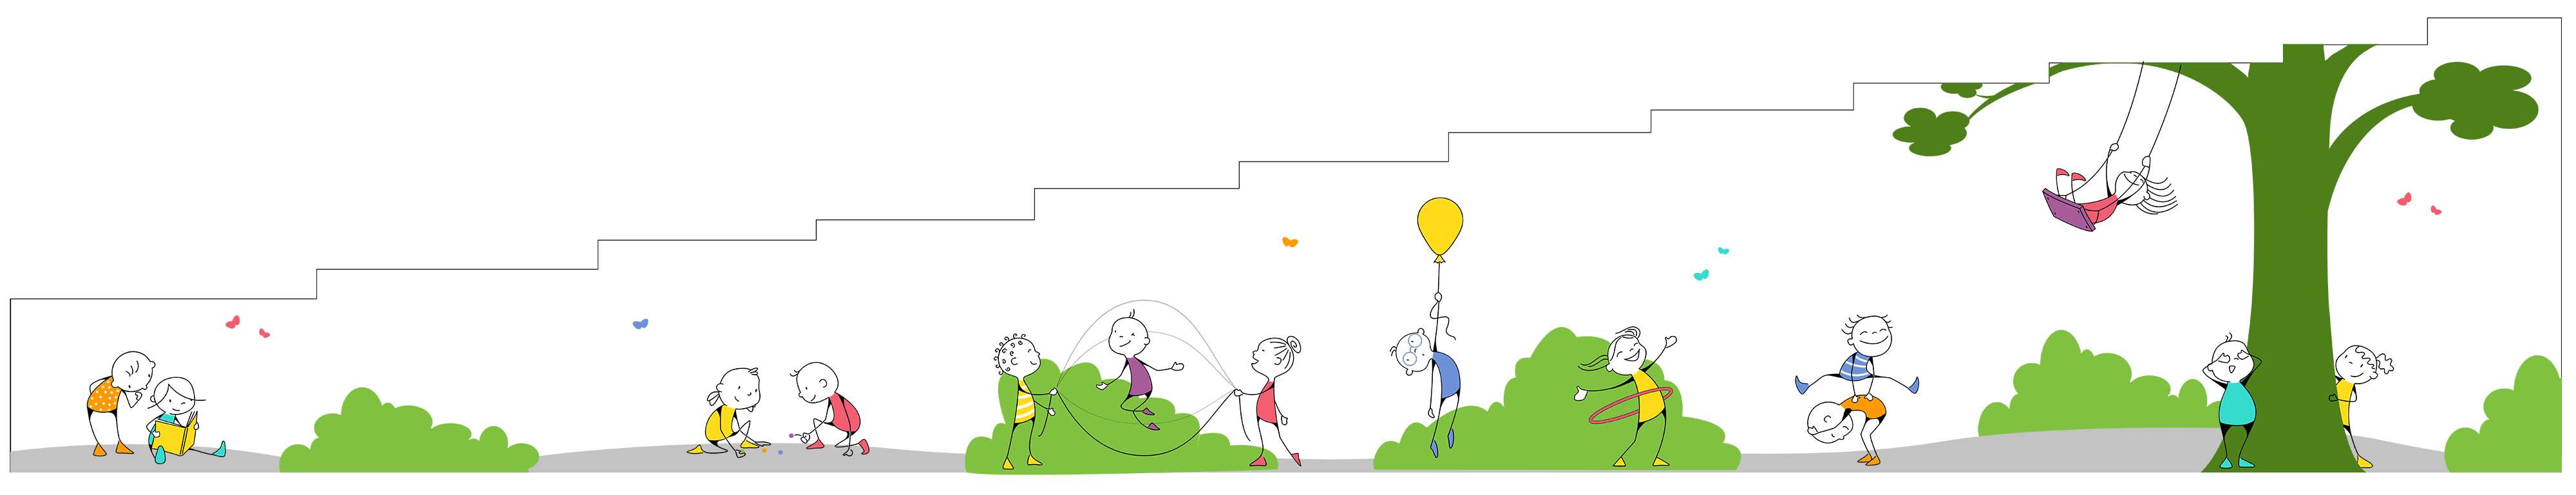 Mural Dia Universal de la Infancia